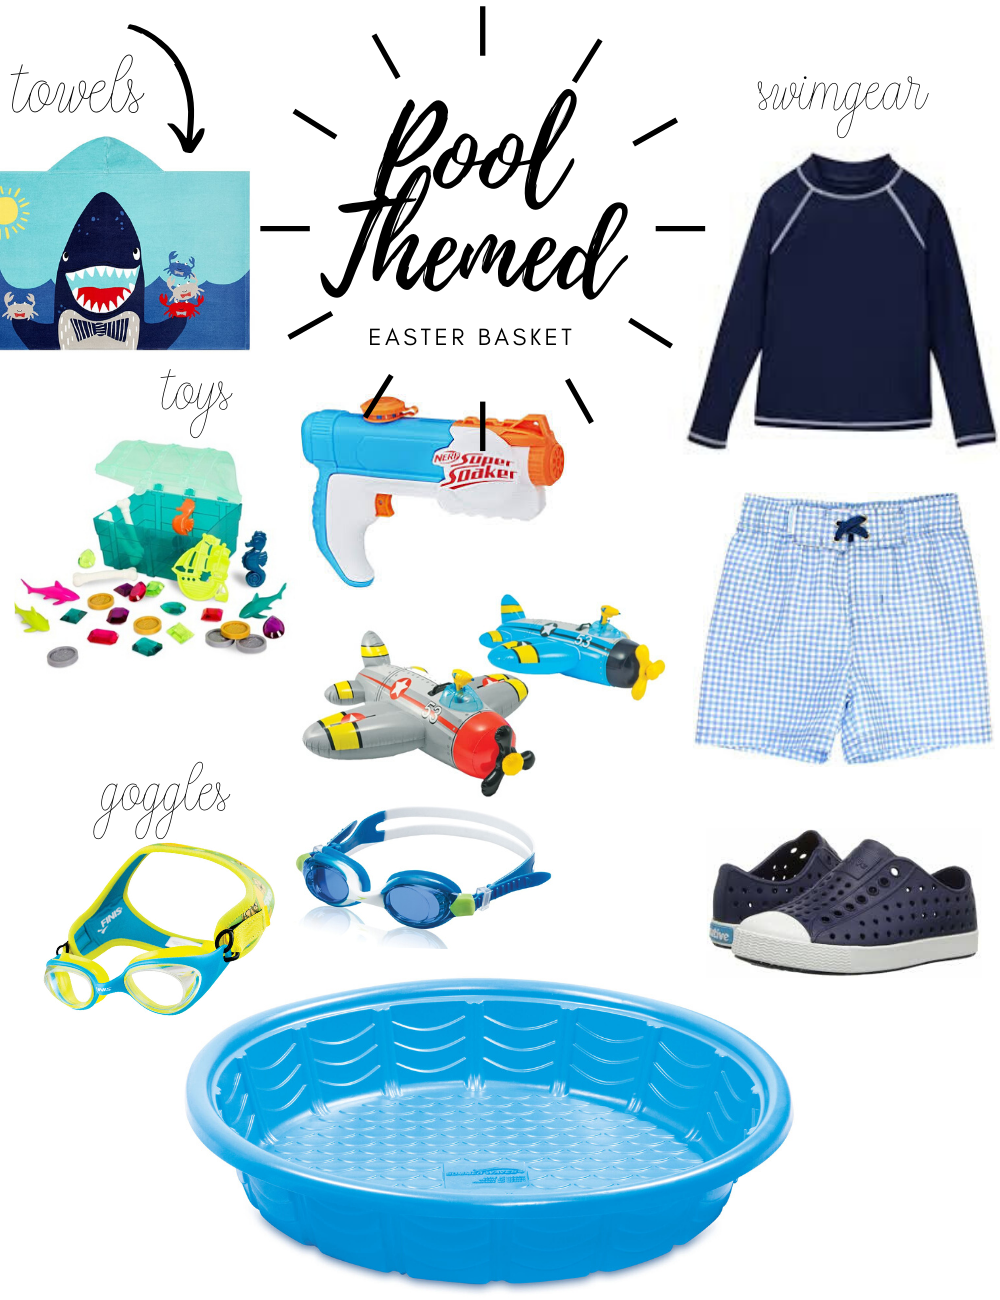 Pool Themed Easter Basket Ideas